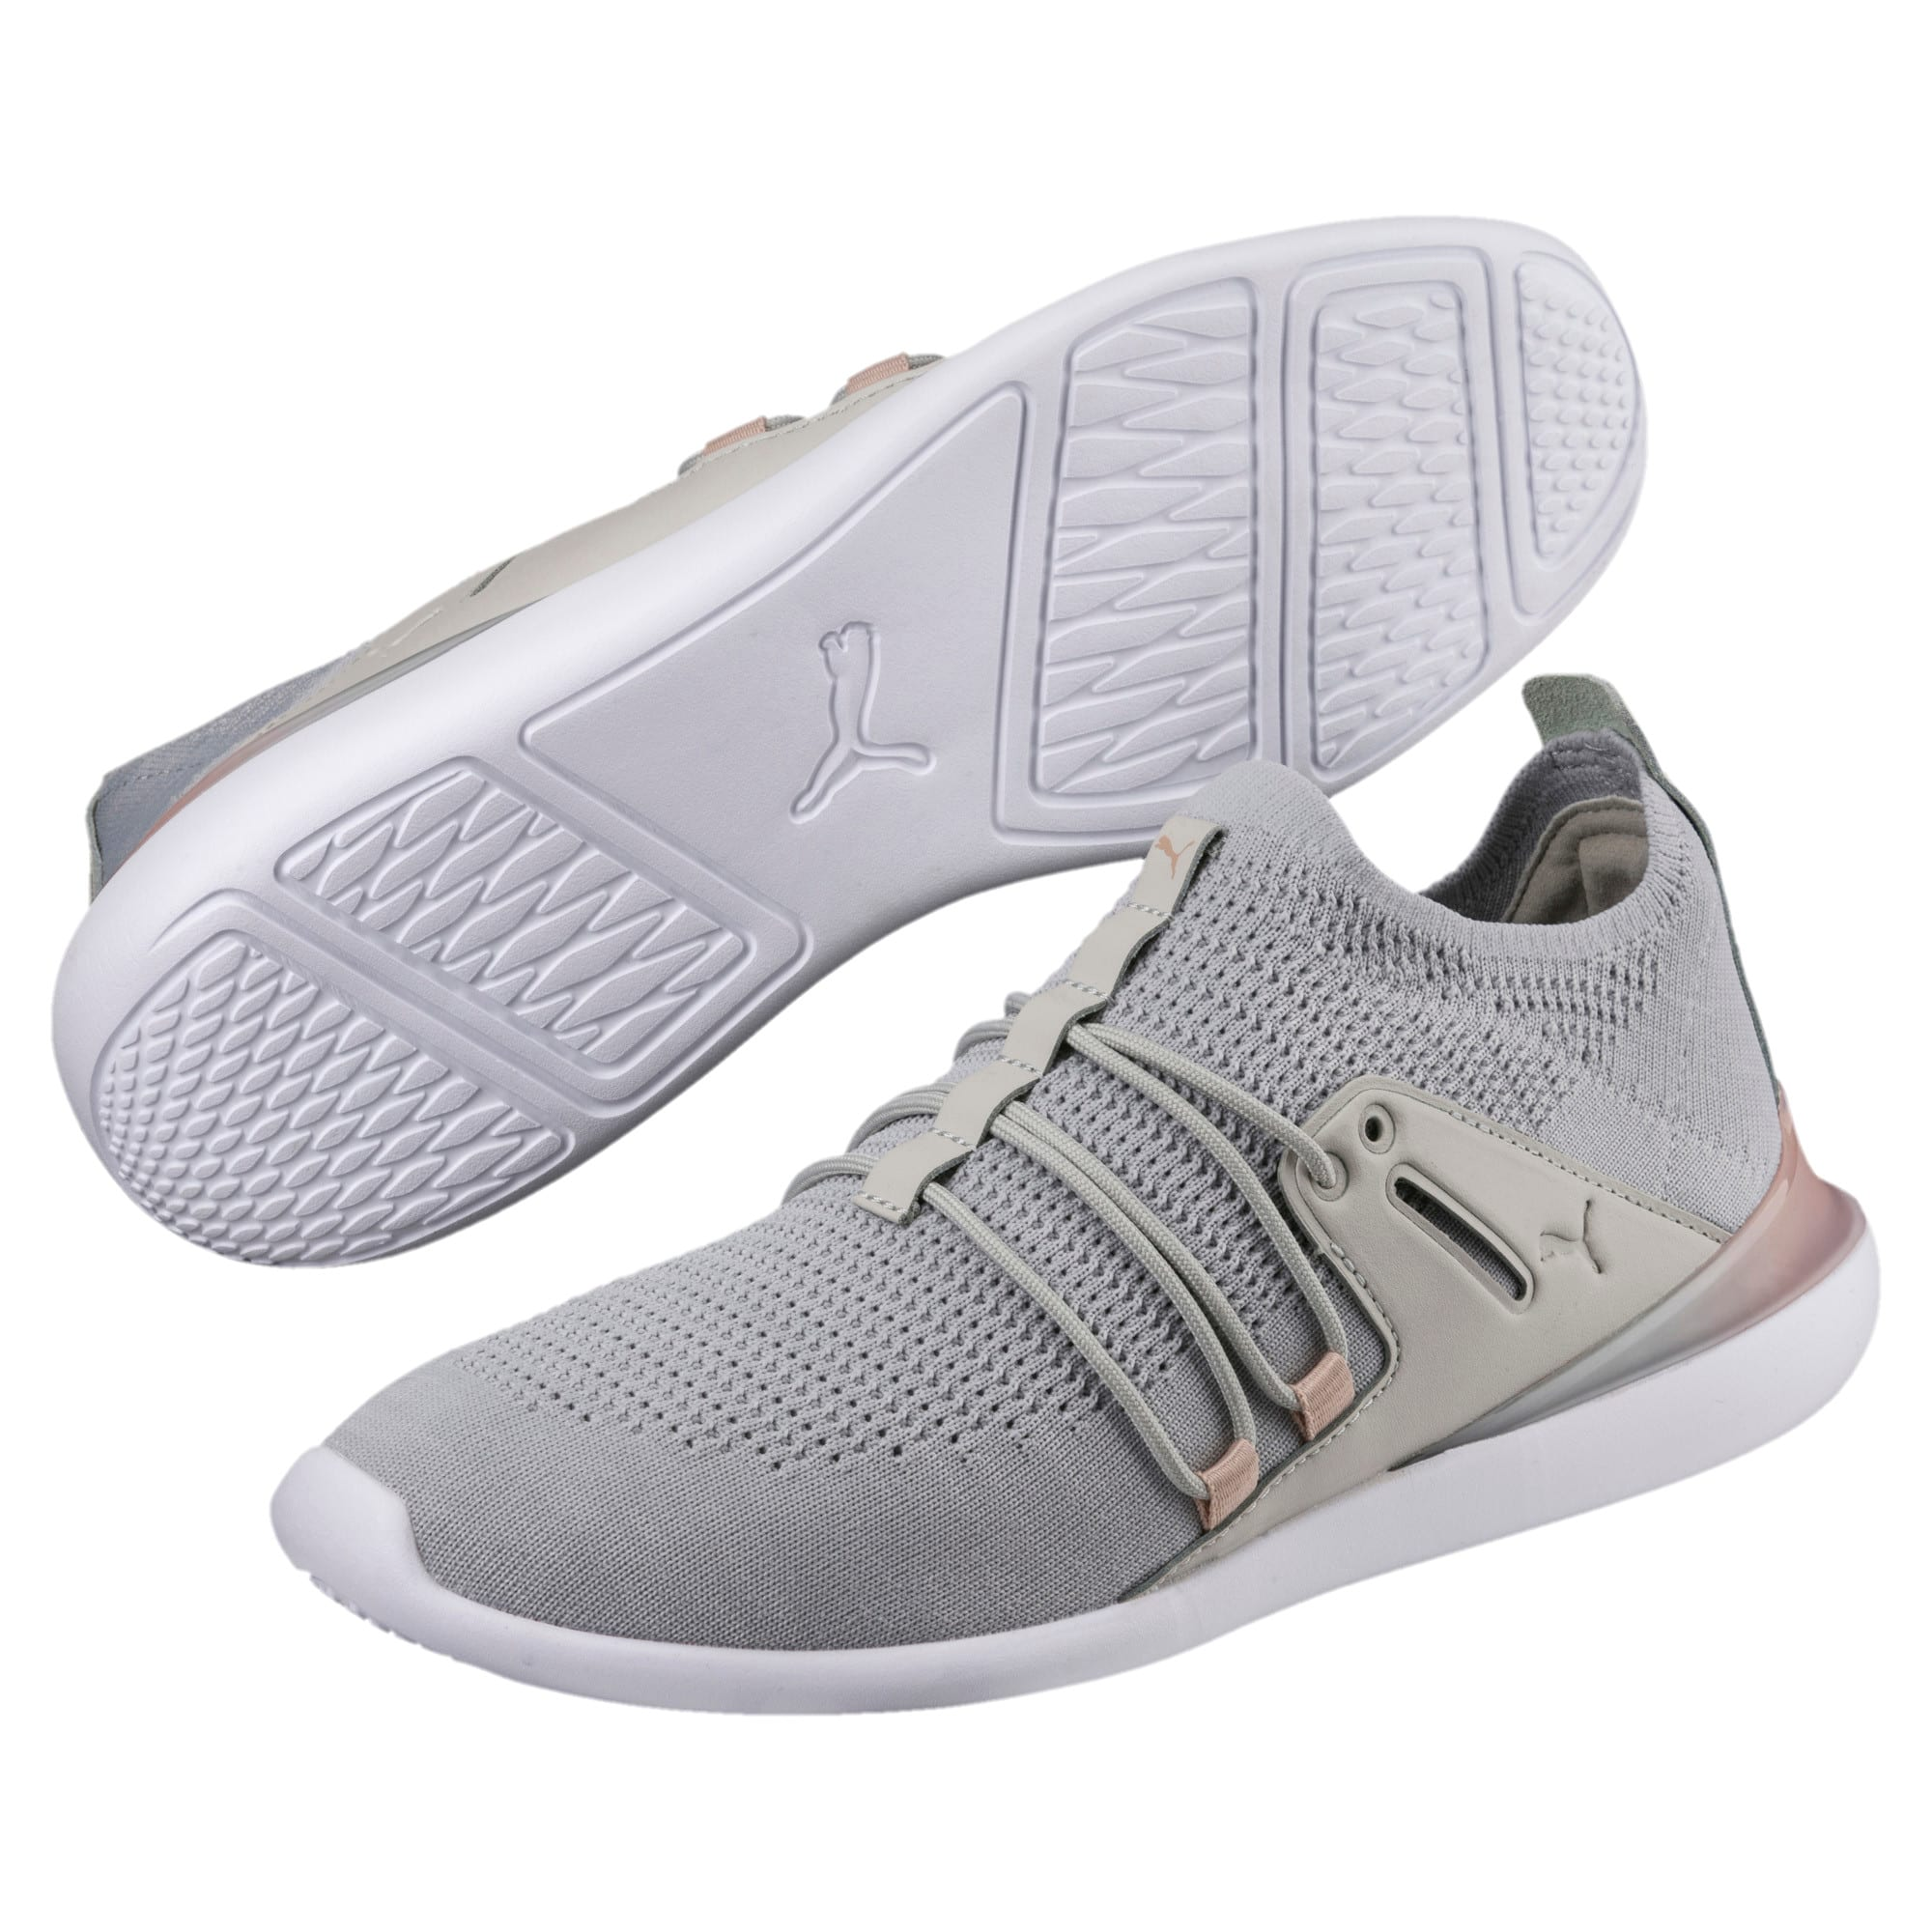 Thumbnail 2 of Evo Cat Sock Lace Monaco Women's Sneakers, GrayViolet-MahoganyRose-Wht, medium